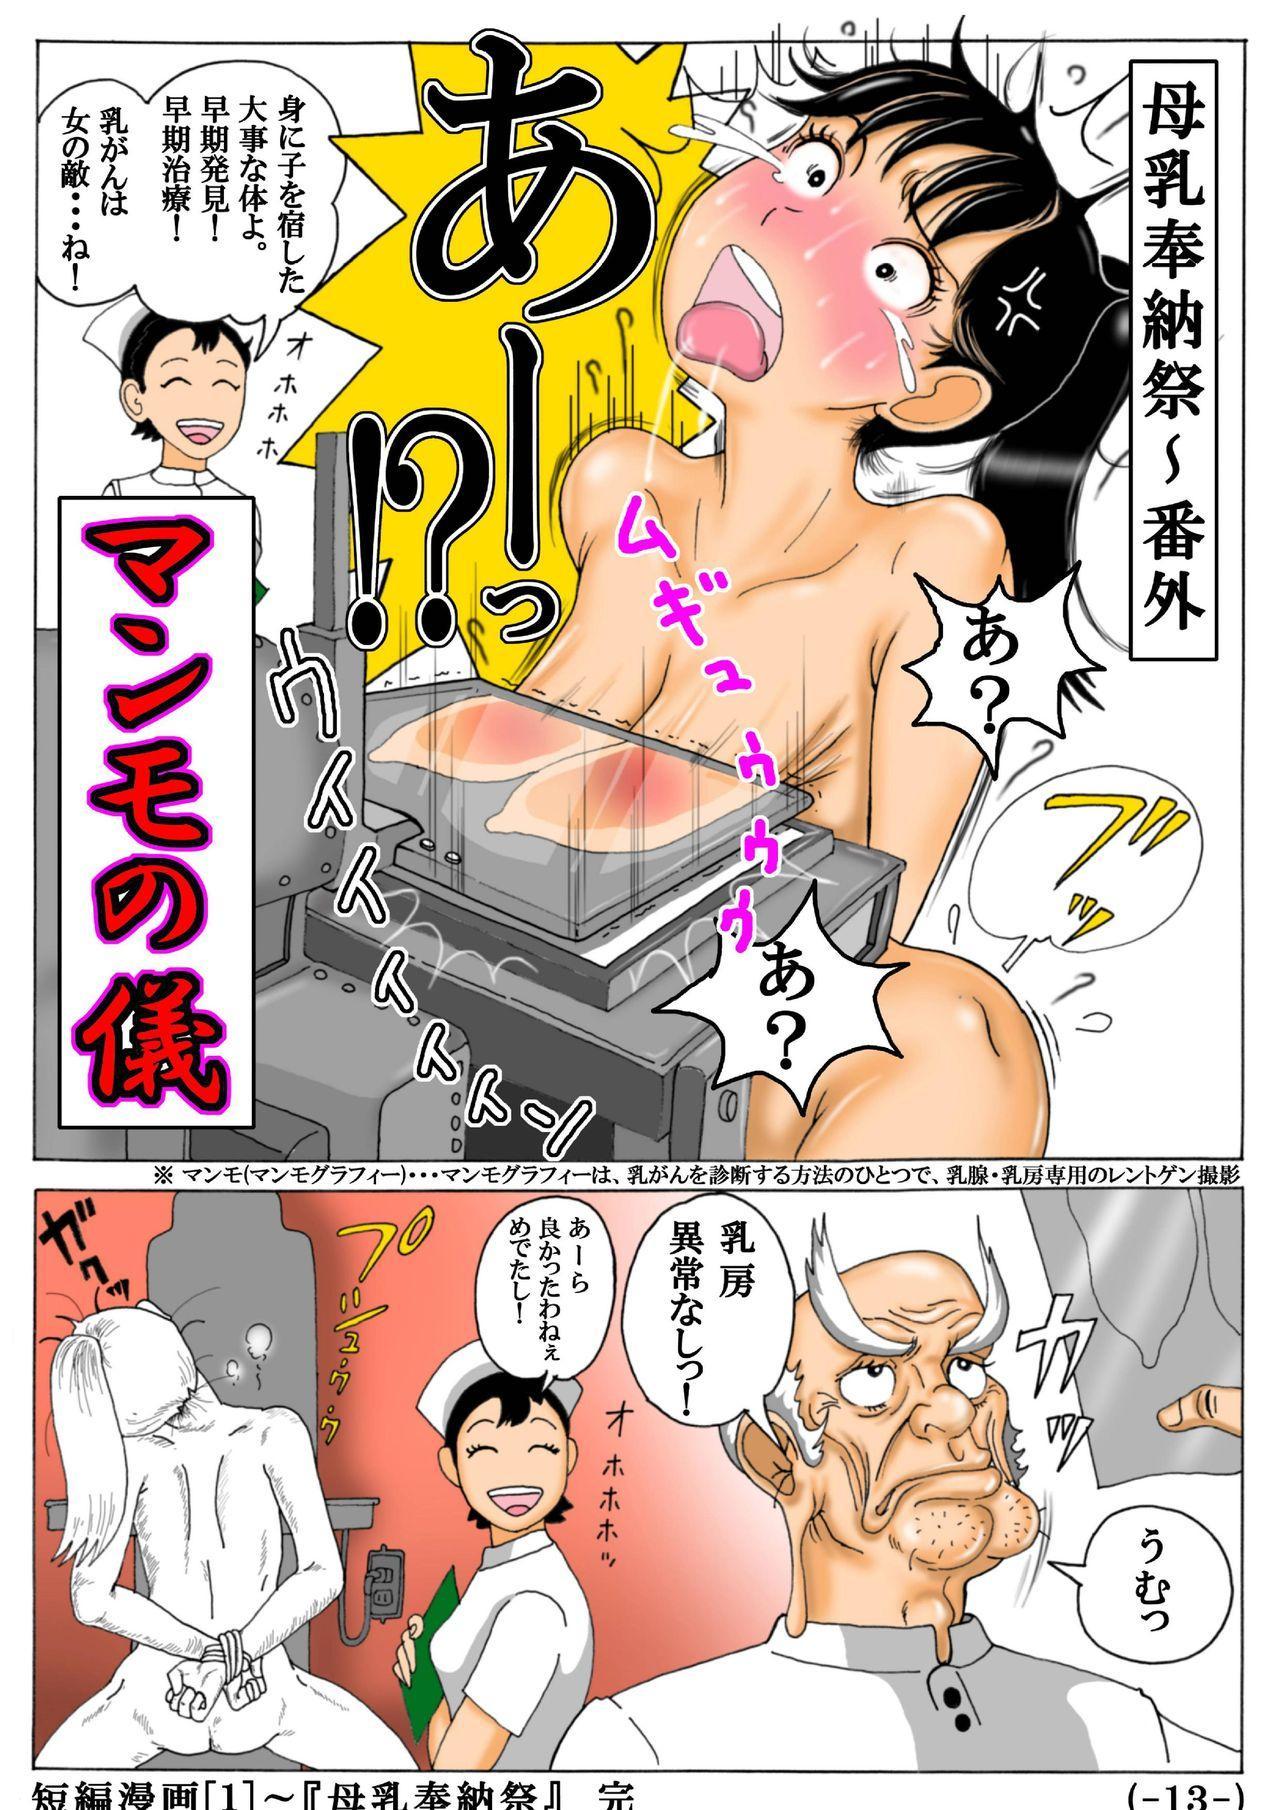 Original Tanpen Manga 2 Hon Date + Original Illust 13